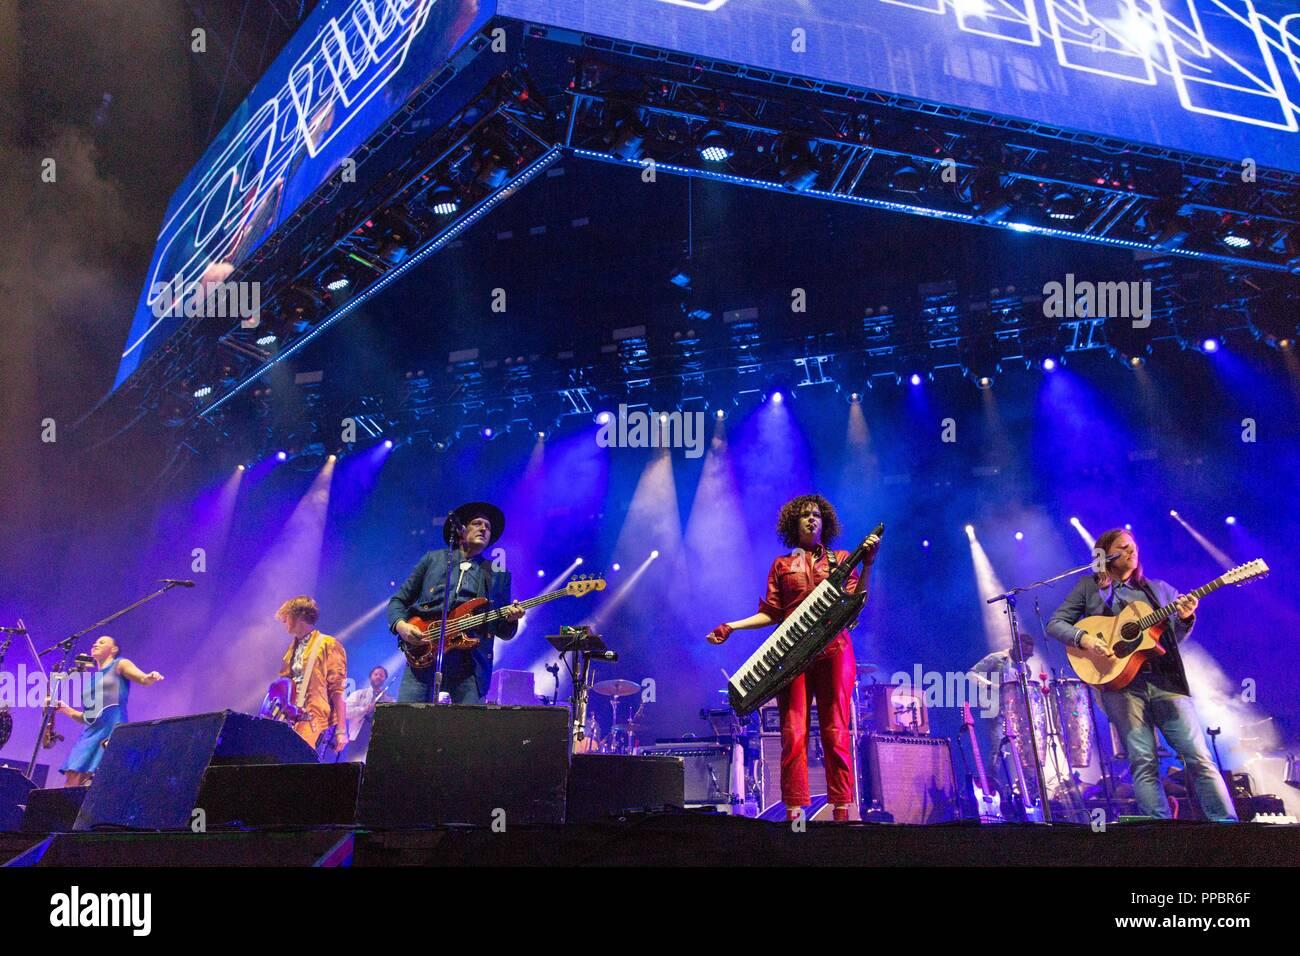 Las Vegas, Nevada, USA. 23rd Sep, 2018. SARAH NEUFELD, RICHARD REED PARRY, STUART BOGIE, WIN BUTLER, REGINE CHASSAGNE, TIWILL DUPRATE and TIM KINGSBURY of Arcade Fire during Life Is Beautiful Music Festival in Las Vegas, Nevada Credit: Daniel DeSlover/ZUMA Wire/Alamy Live News - Stock Image